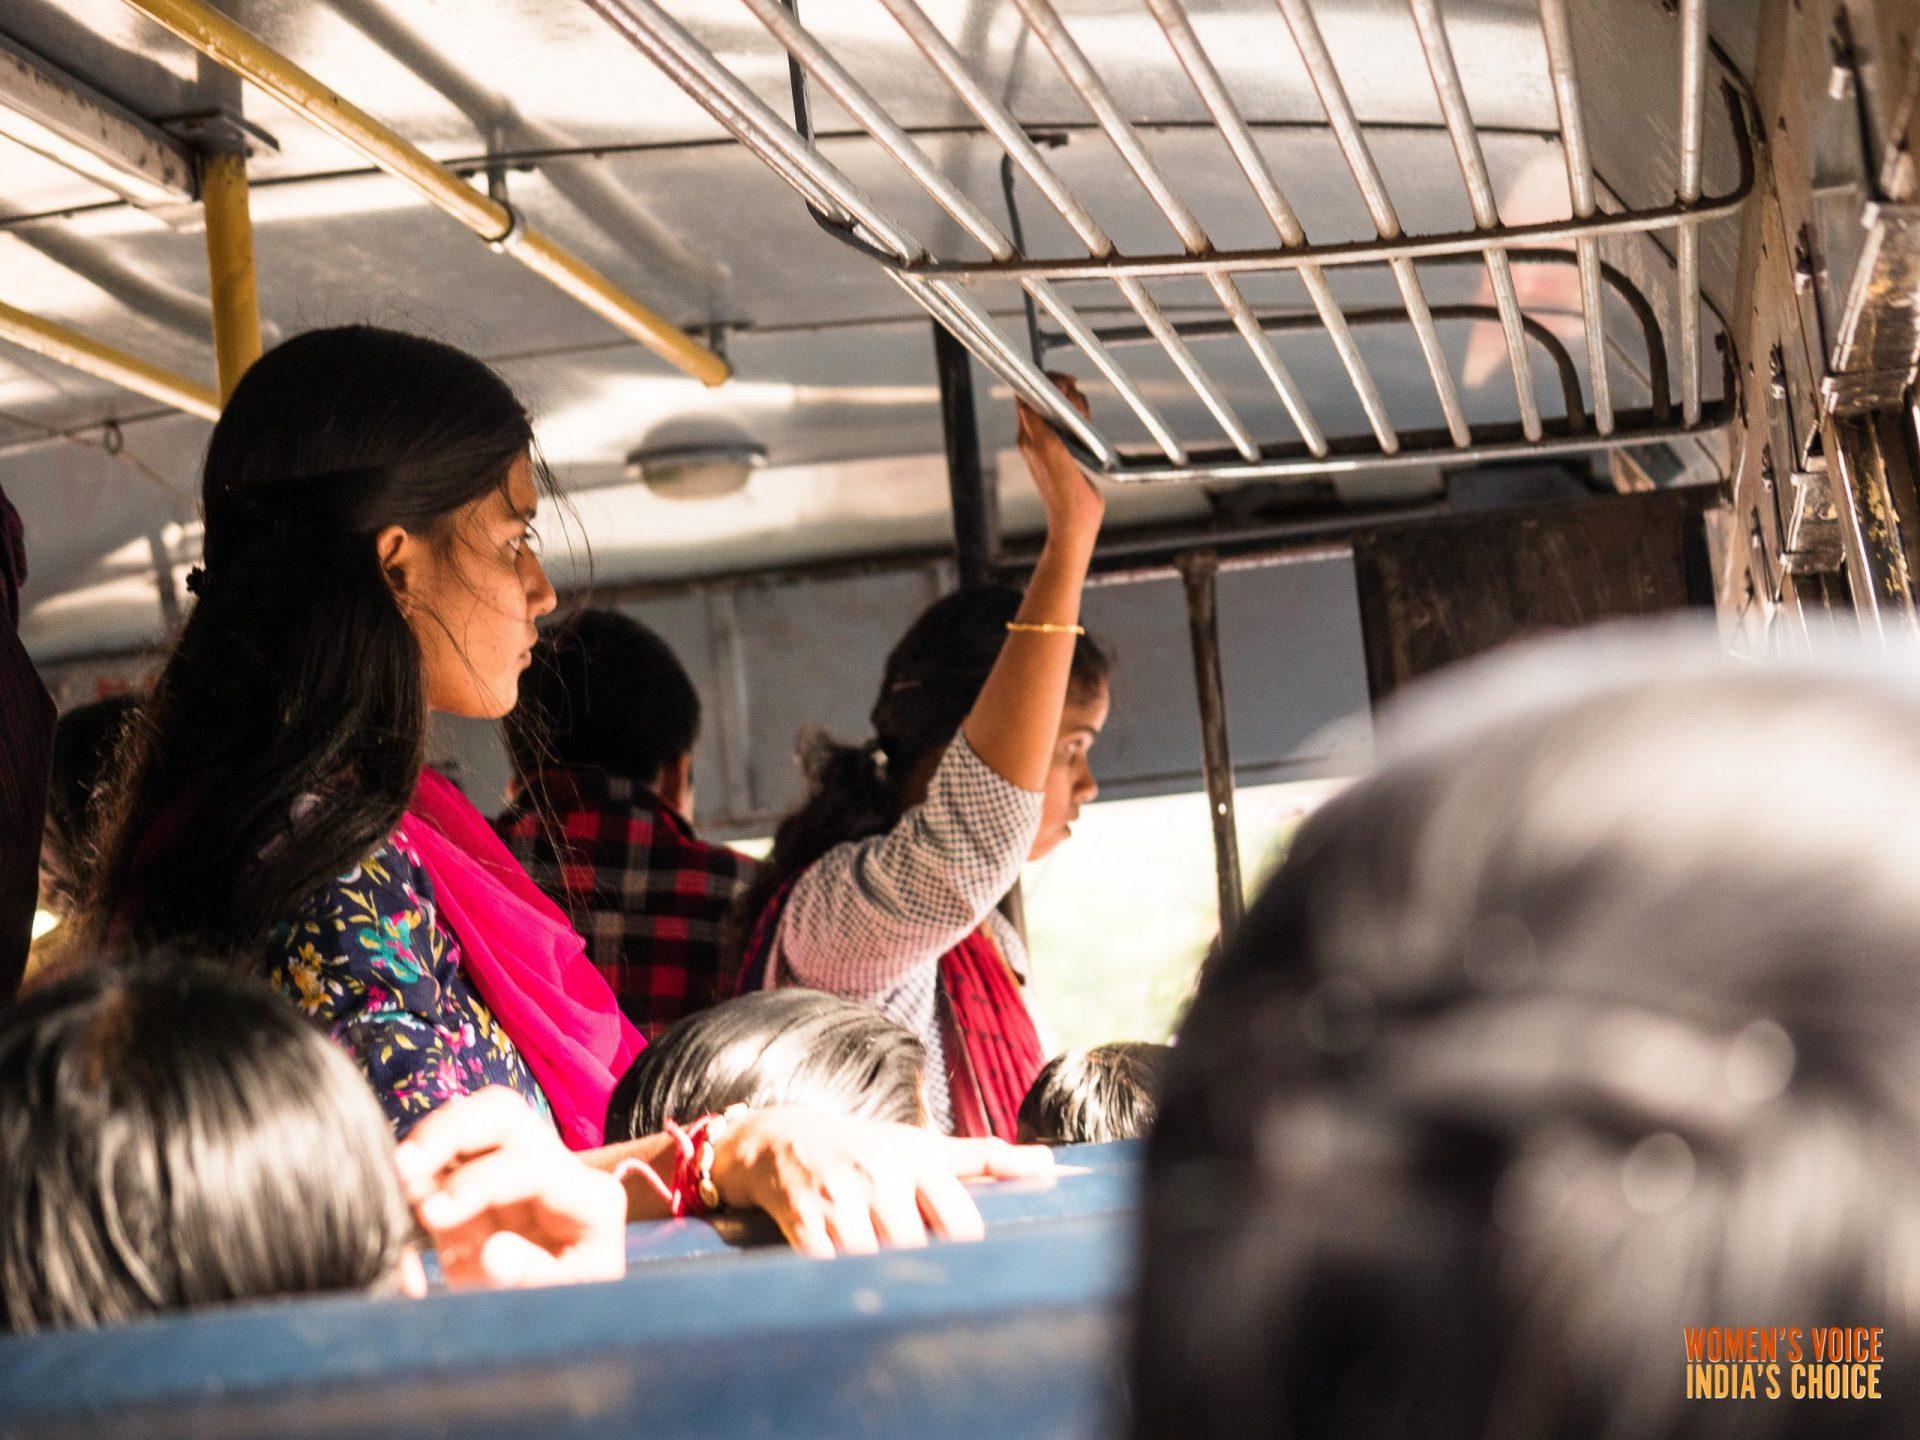 WOMEN'S VOICE – INDIA'S CHOICE a documentary